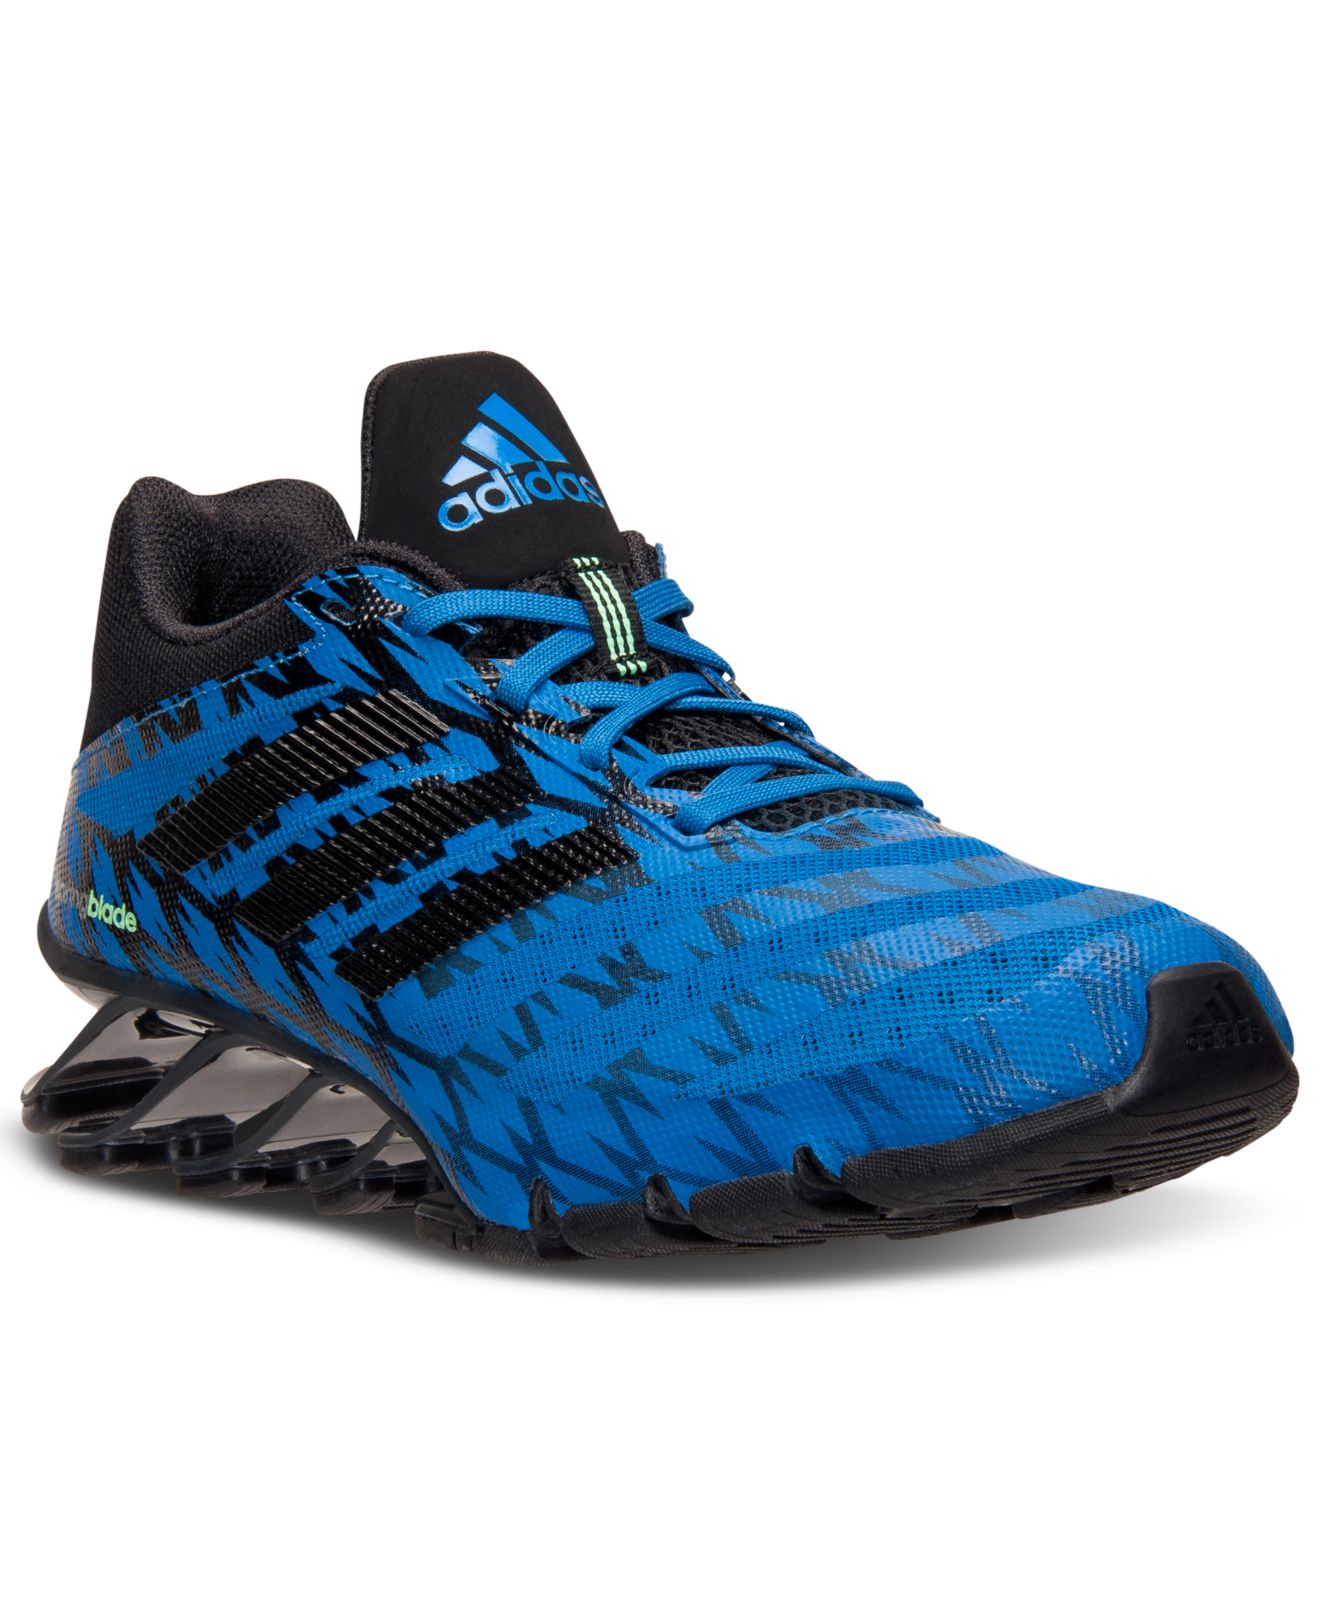 Finish Line Adidas Running Shoes